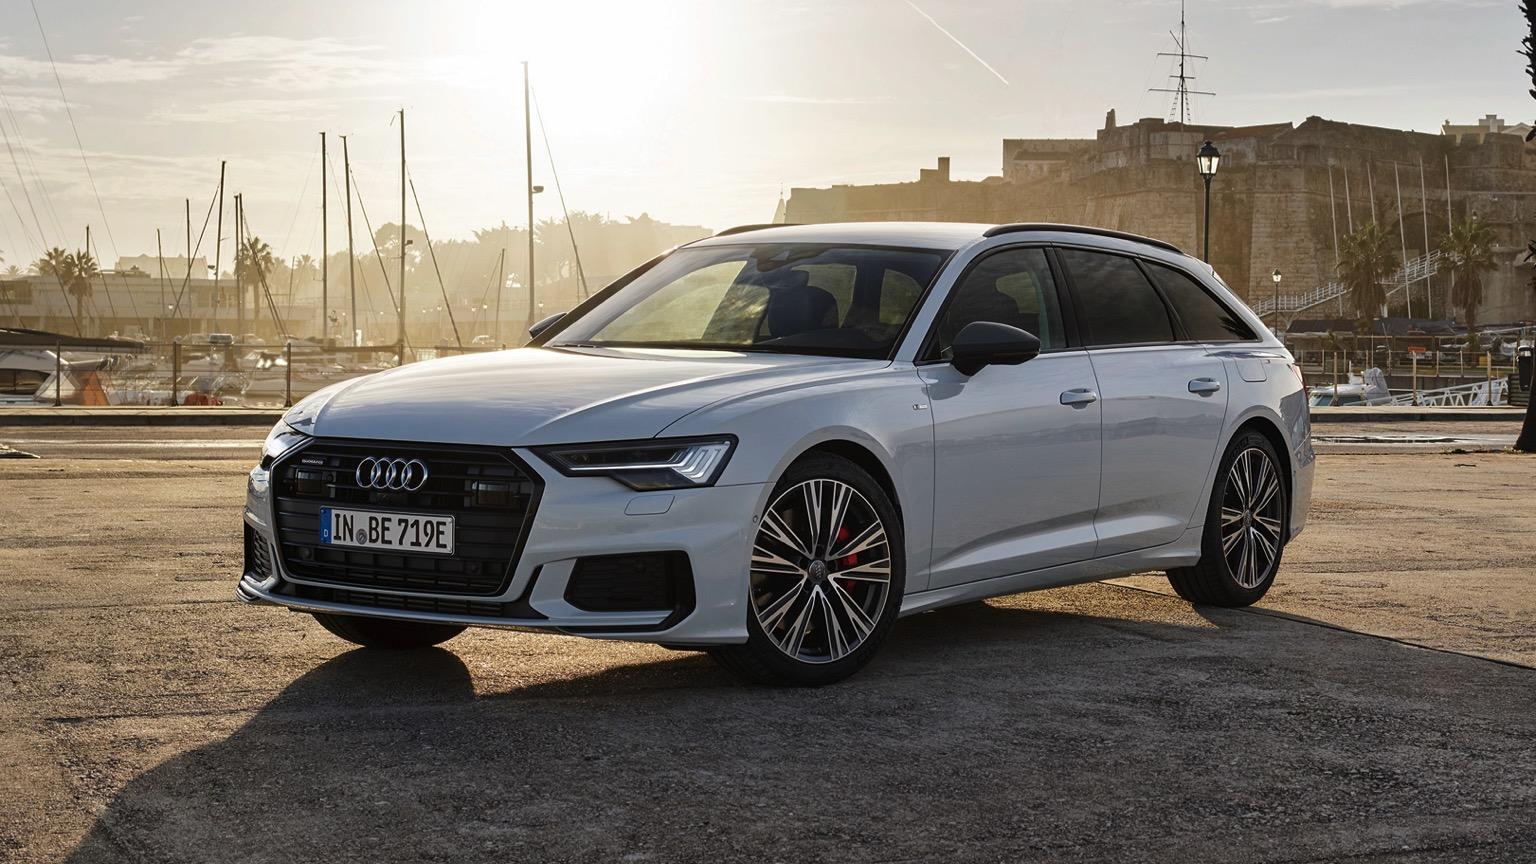 Audi A6 Avant 55 TFSI e quattro (2021)